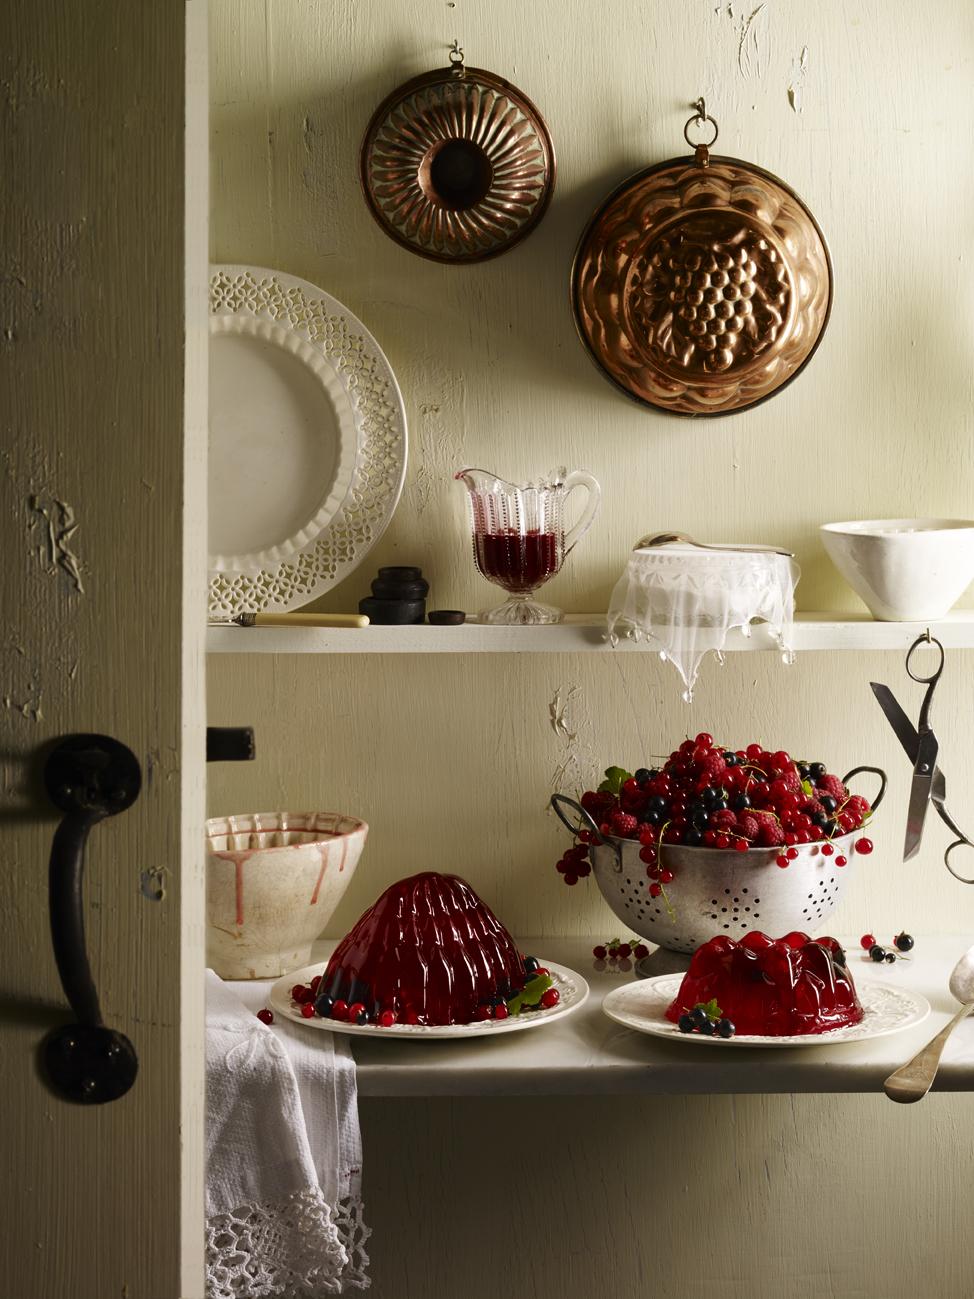 Cream kitchen still life with jellies